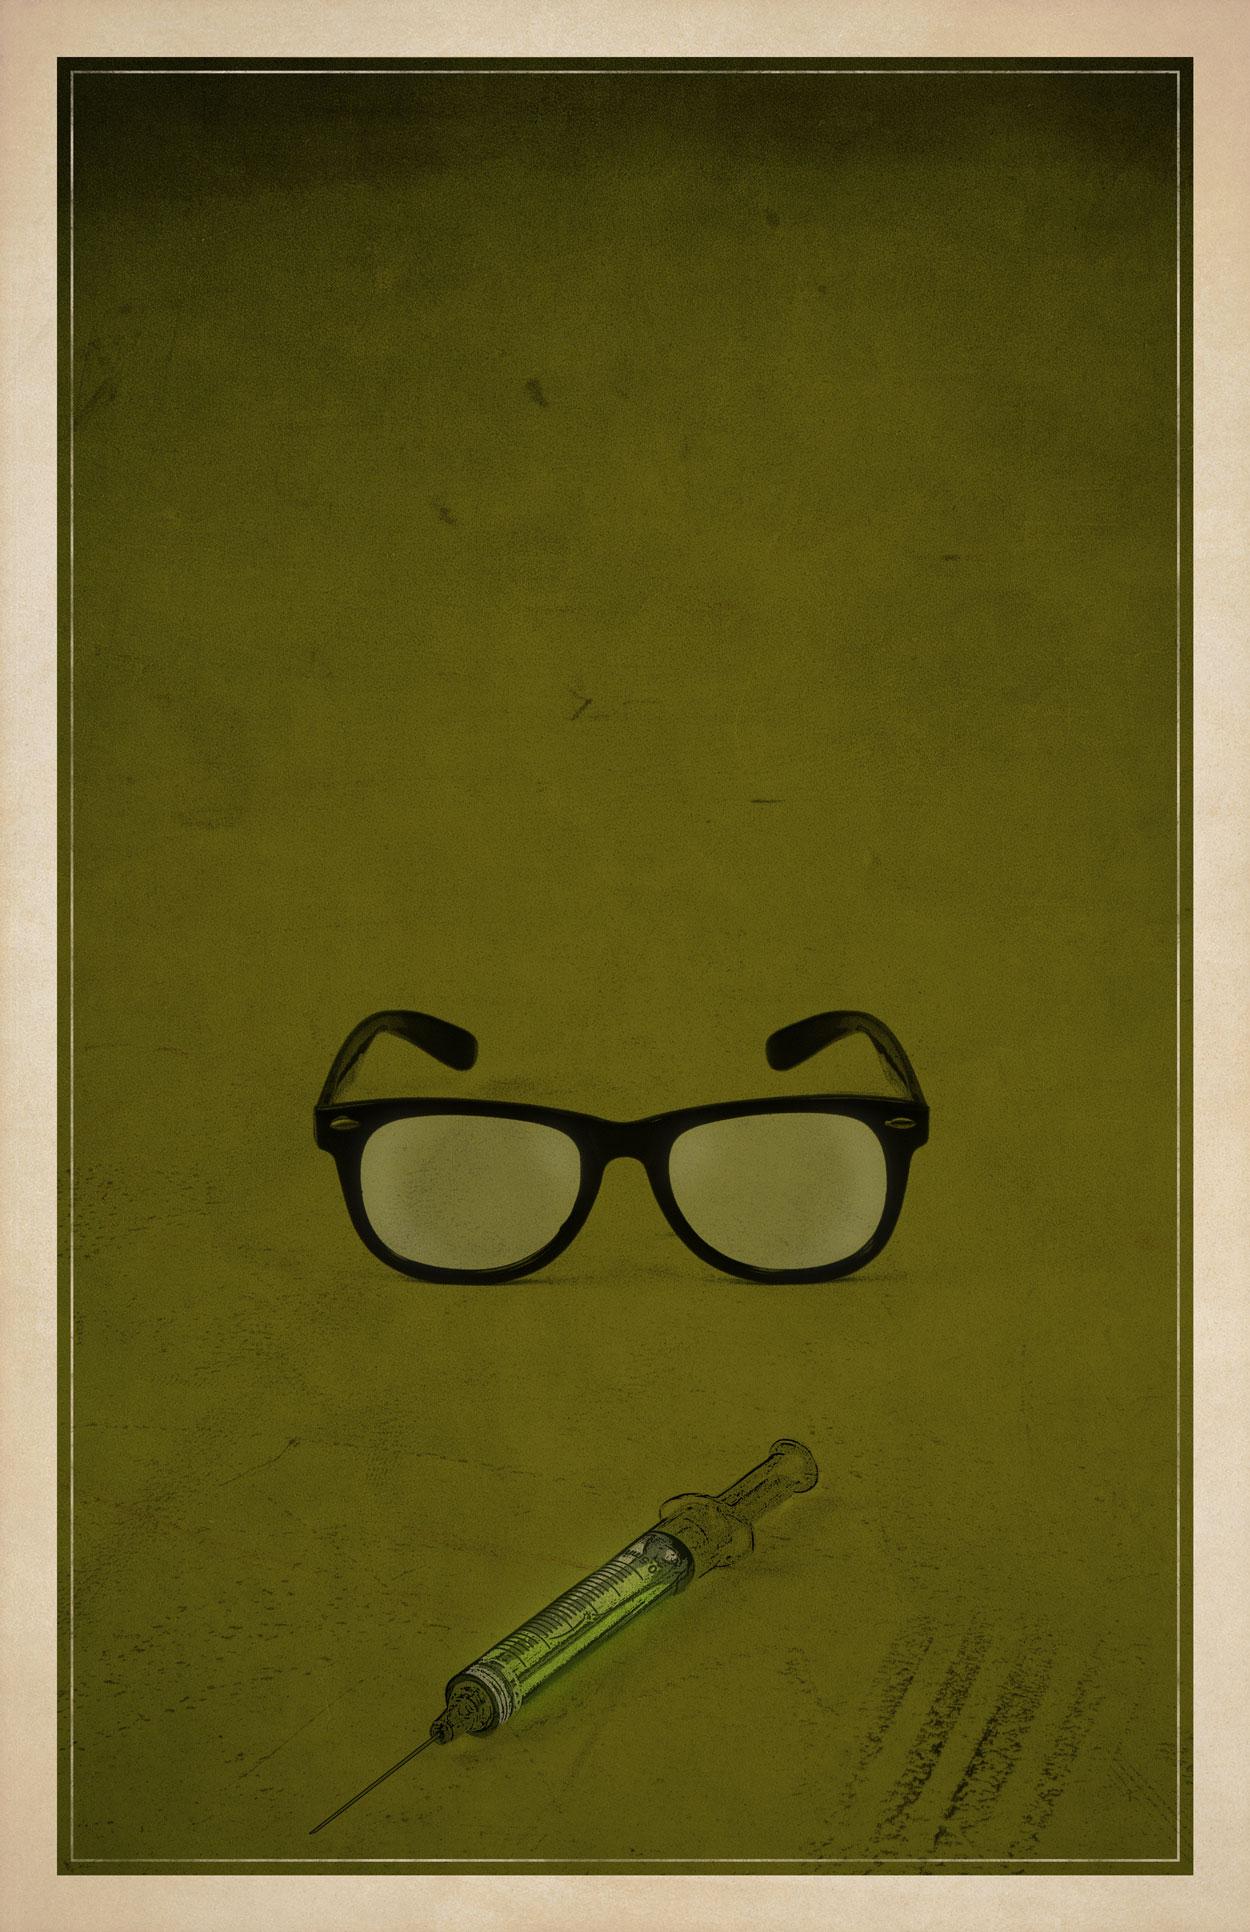 Re-Animator Minimalist Poster